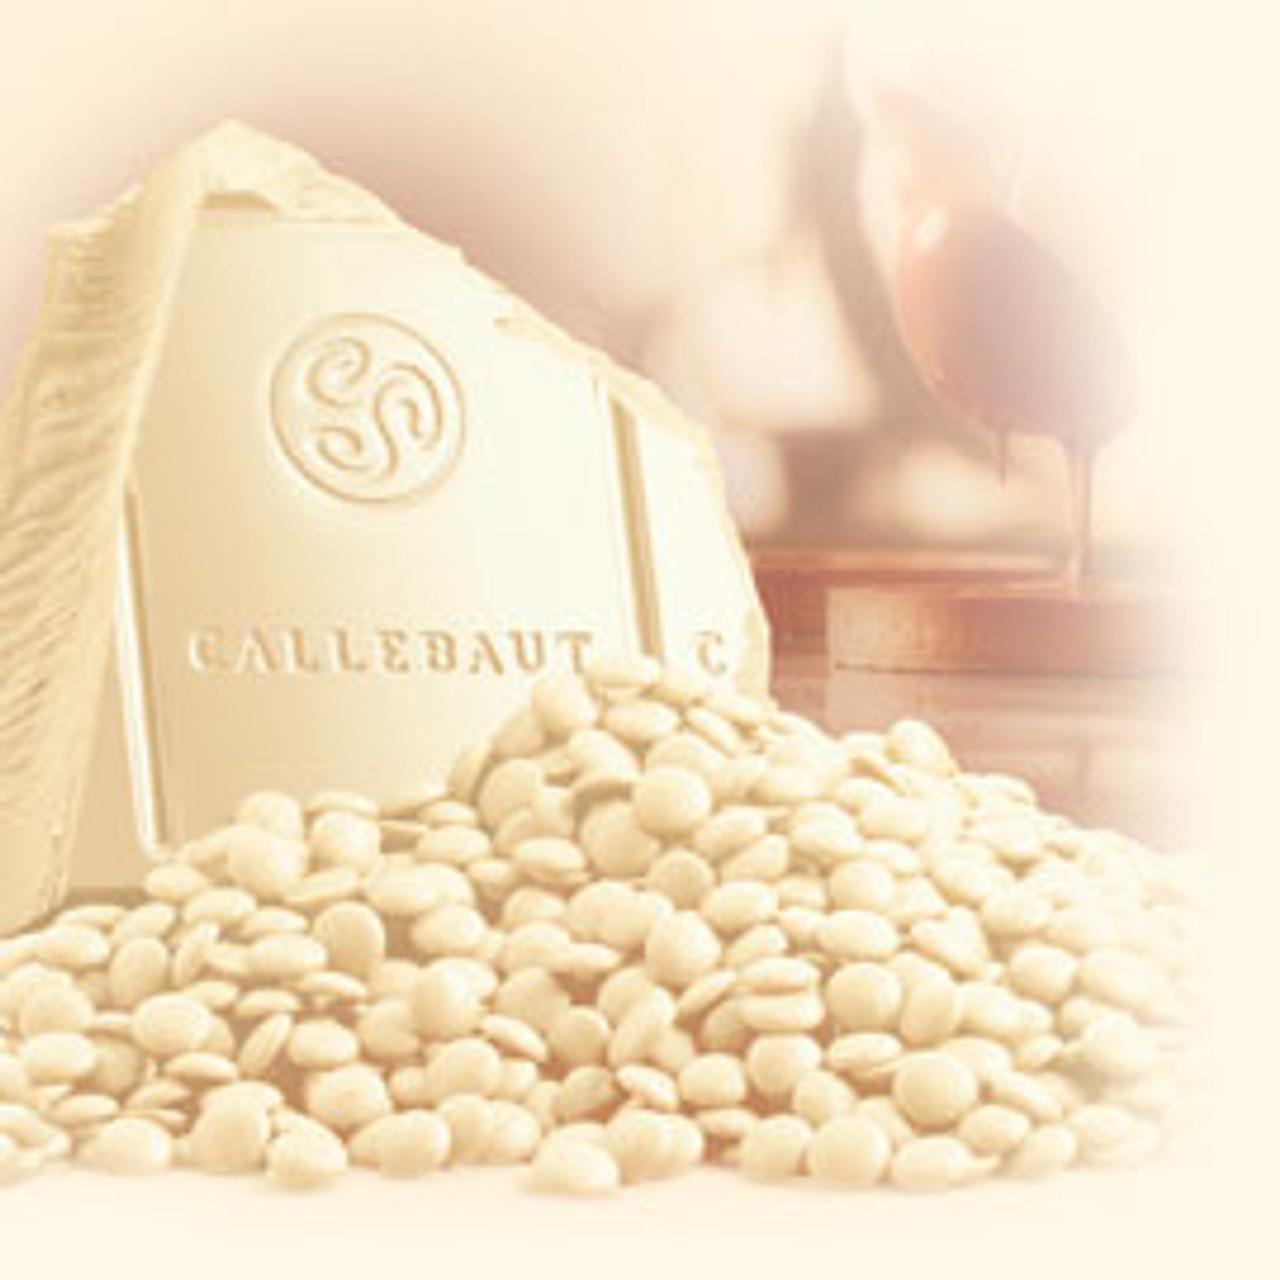 Chocolate Callets Callebaut 1kg W2NV White